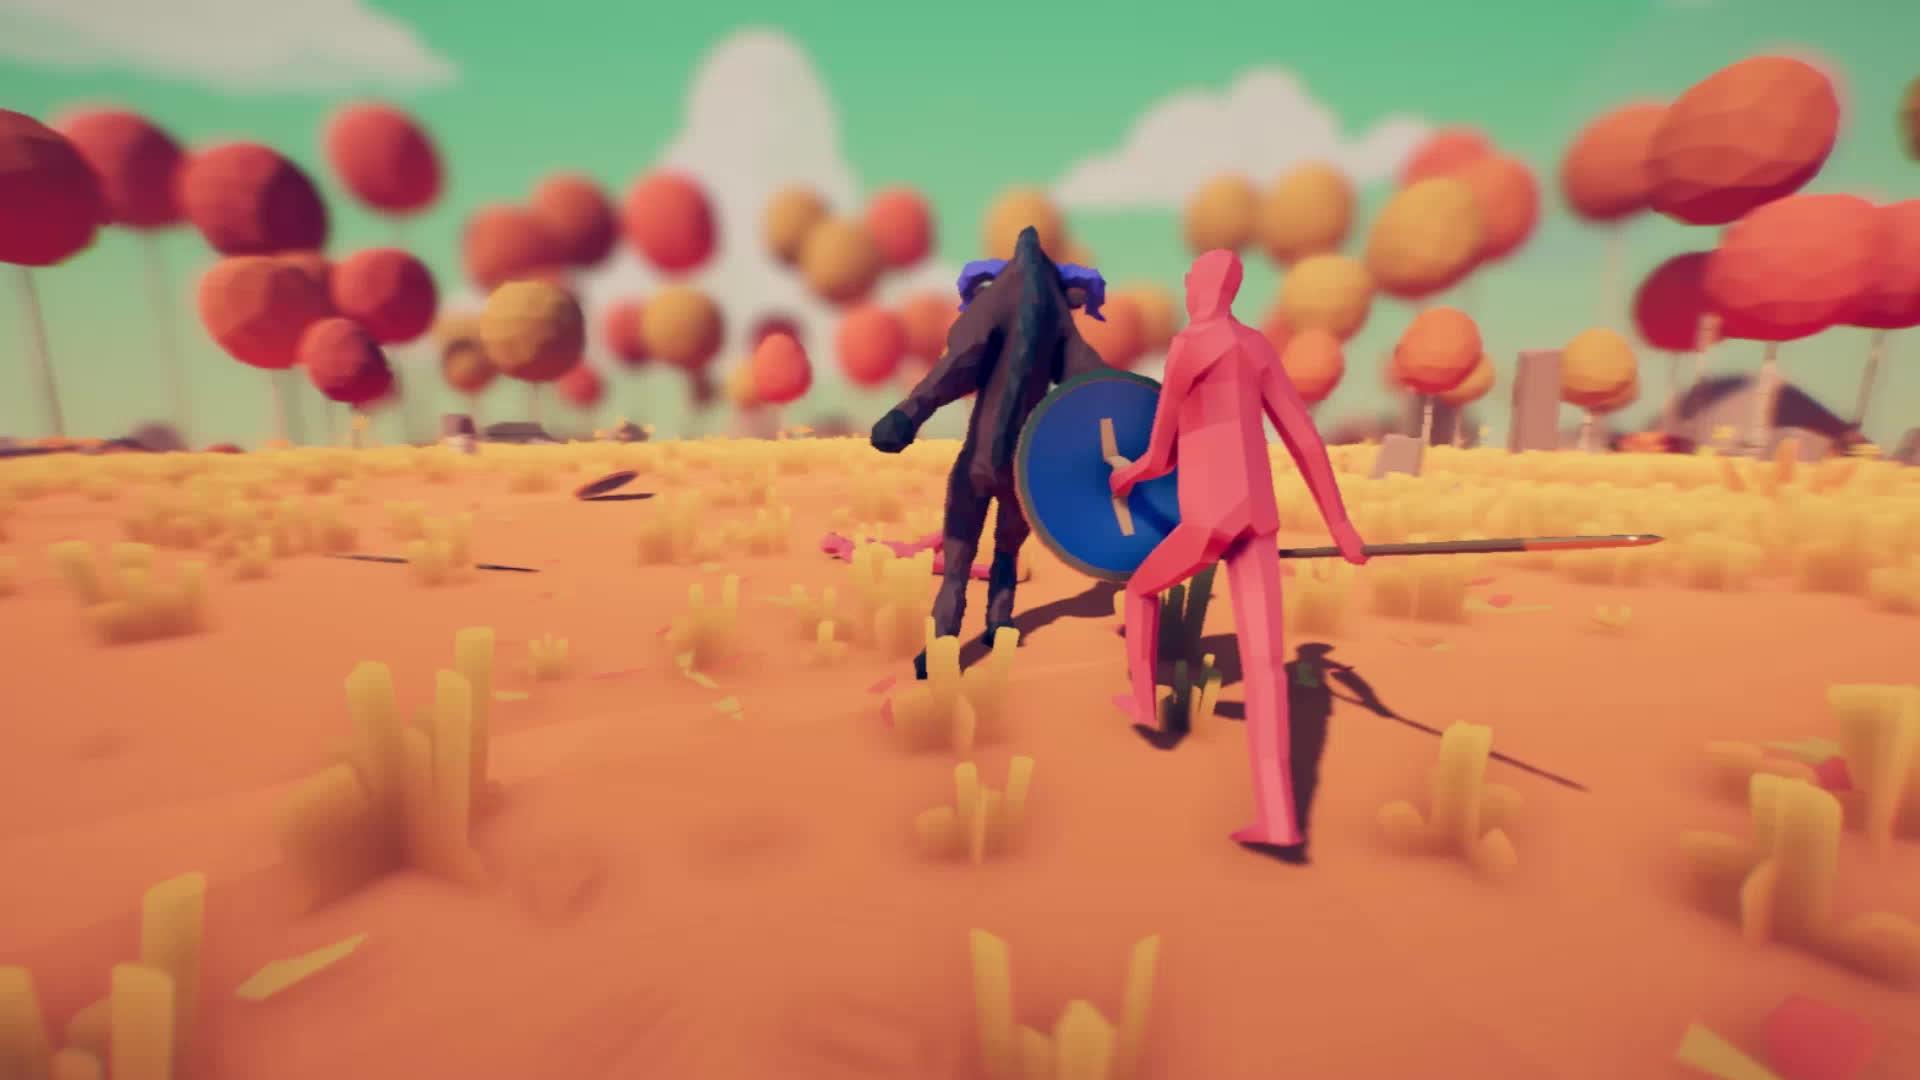 AccurateBattleSim, Unity3D,  GIFs